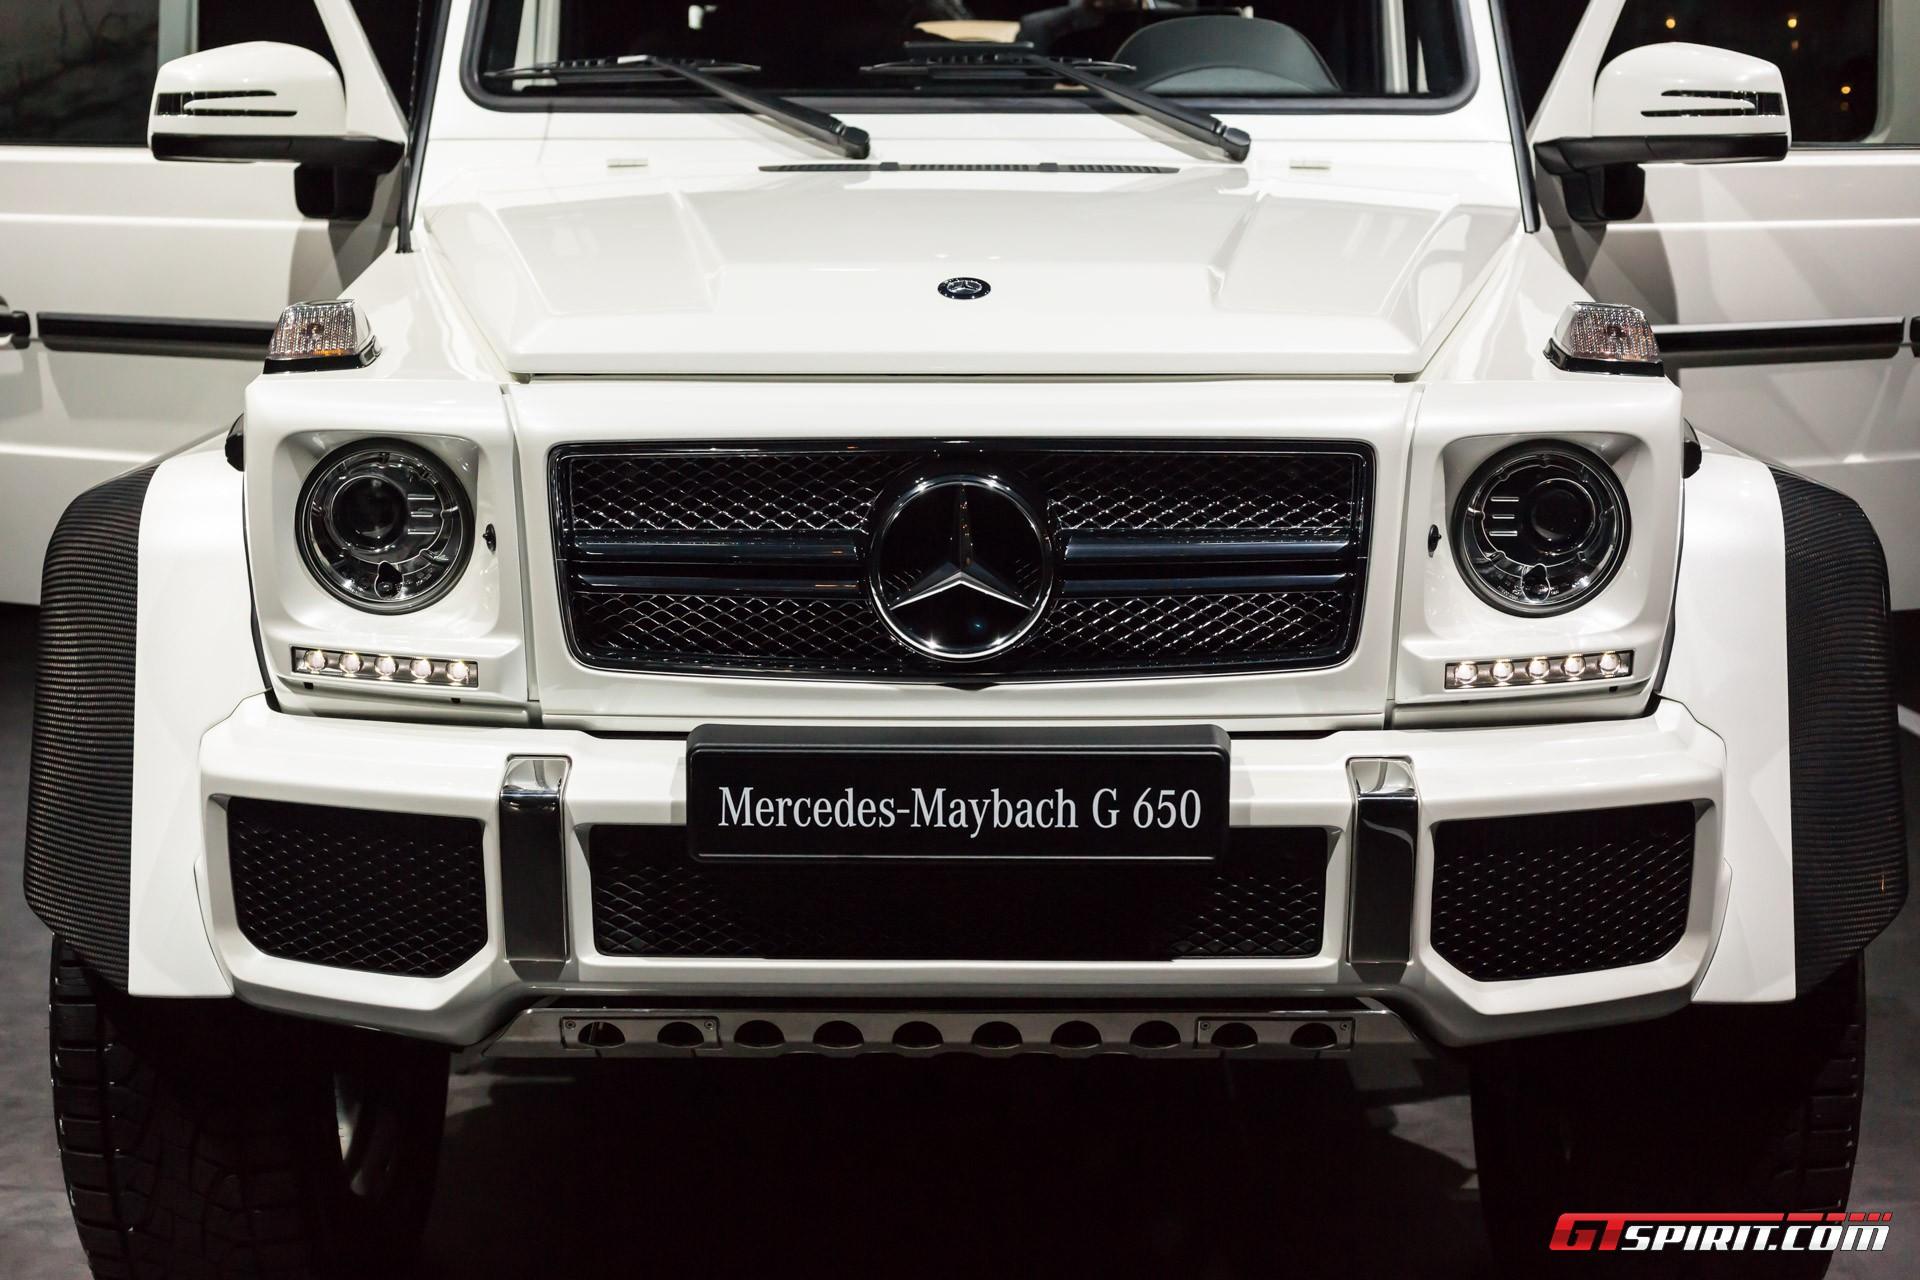 https://storage.googleapis.com/gtspirit/uploads/2017/02/Mercedes-Benz-Maybach-G650-Landaulet-Geneva-2017-13.jpg